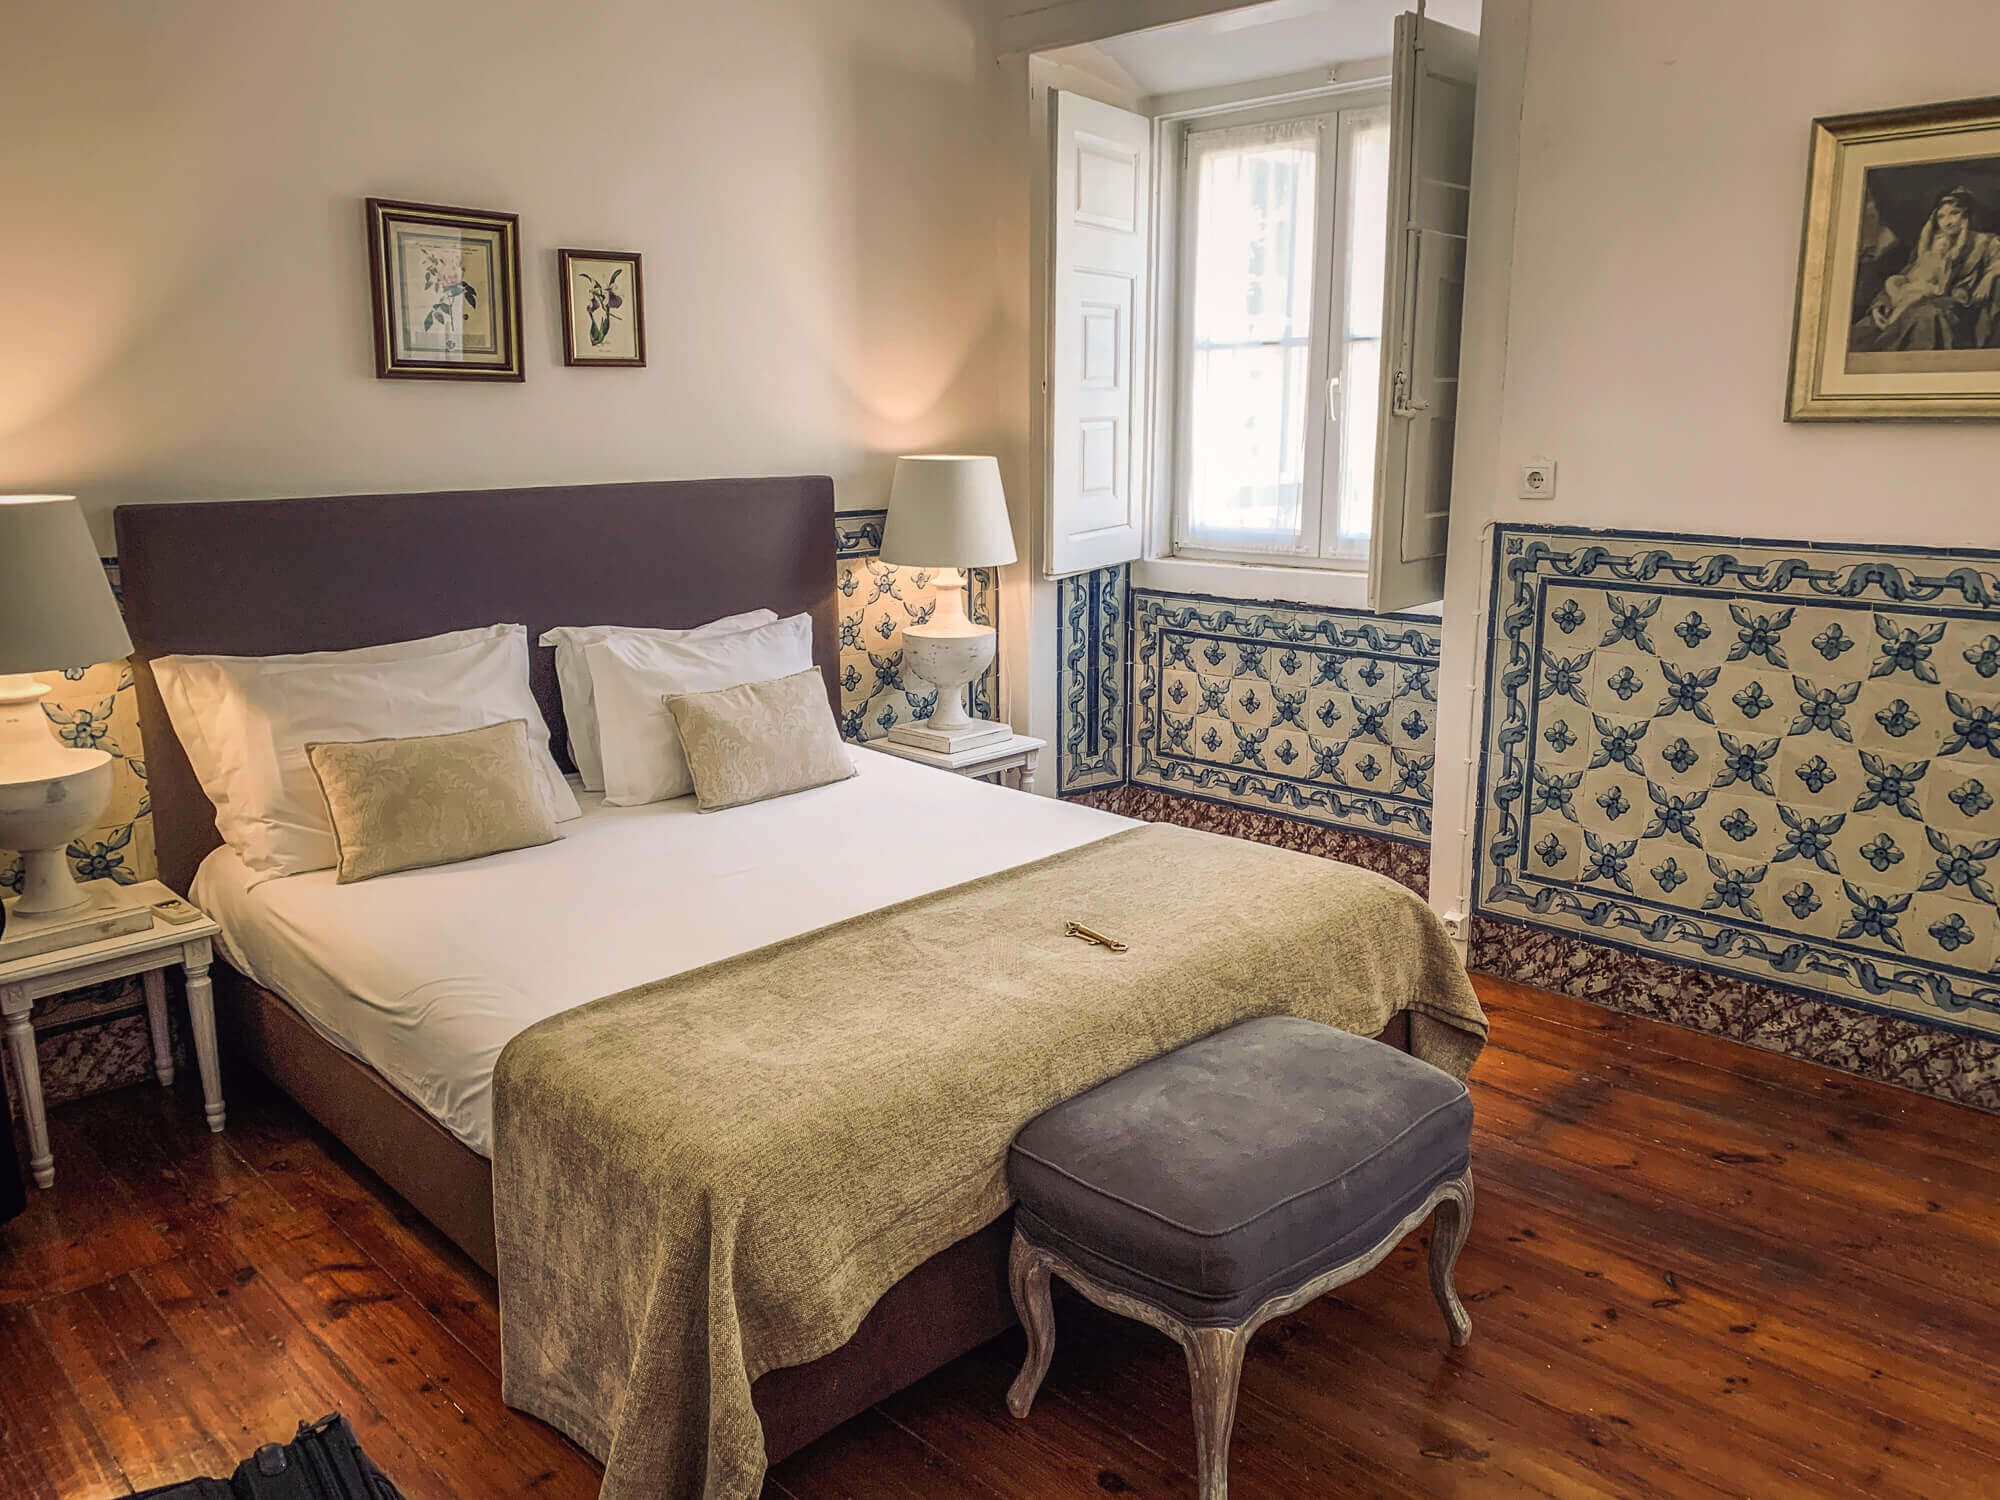 Palacio Ramalhete room